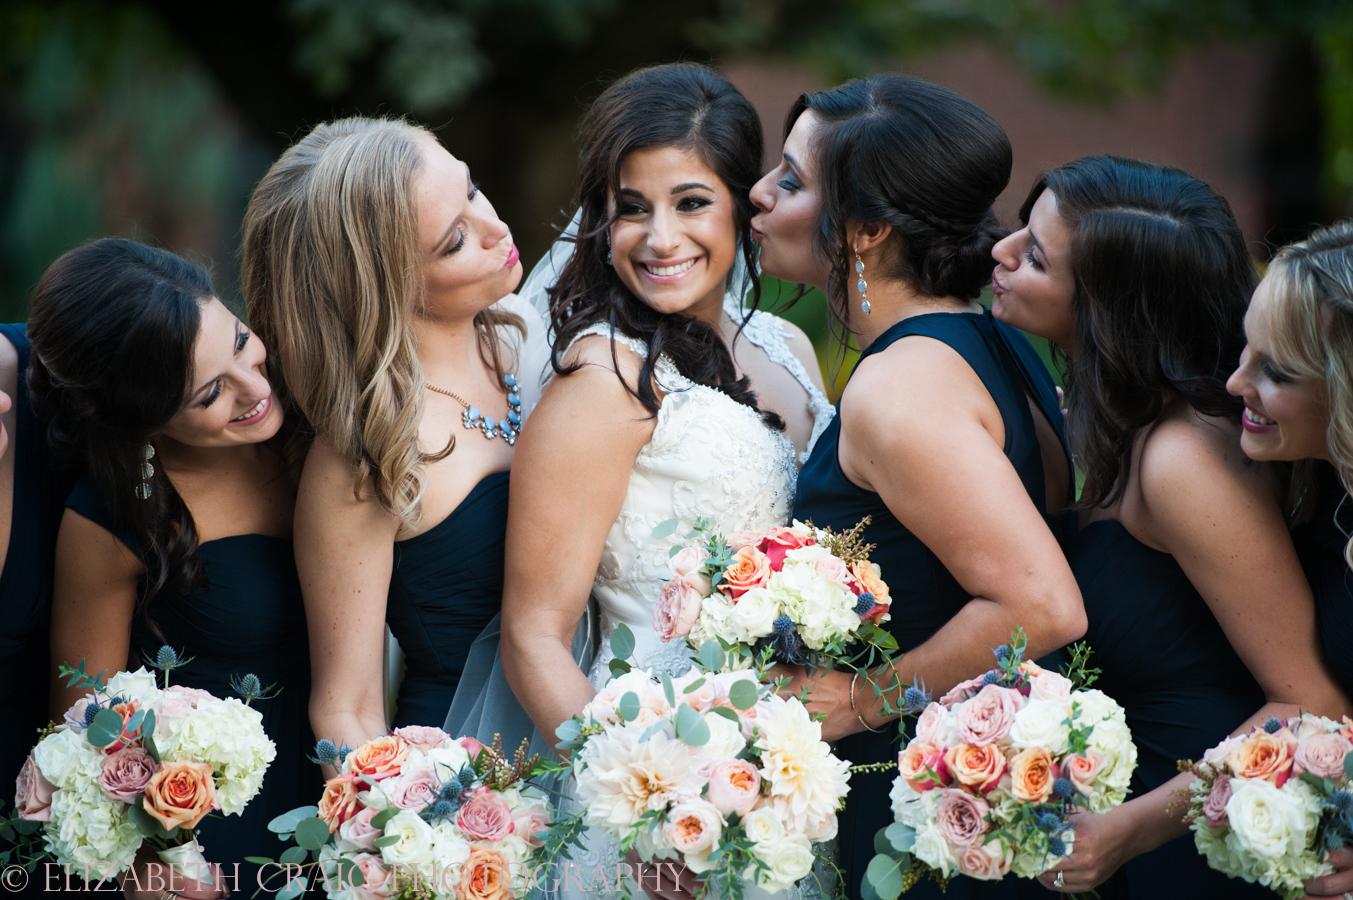 pittsburgh-greek-weddings-fairmont-weddings-receptions-elizabeth-craig-photohgraphy-016